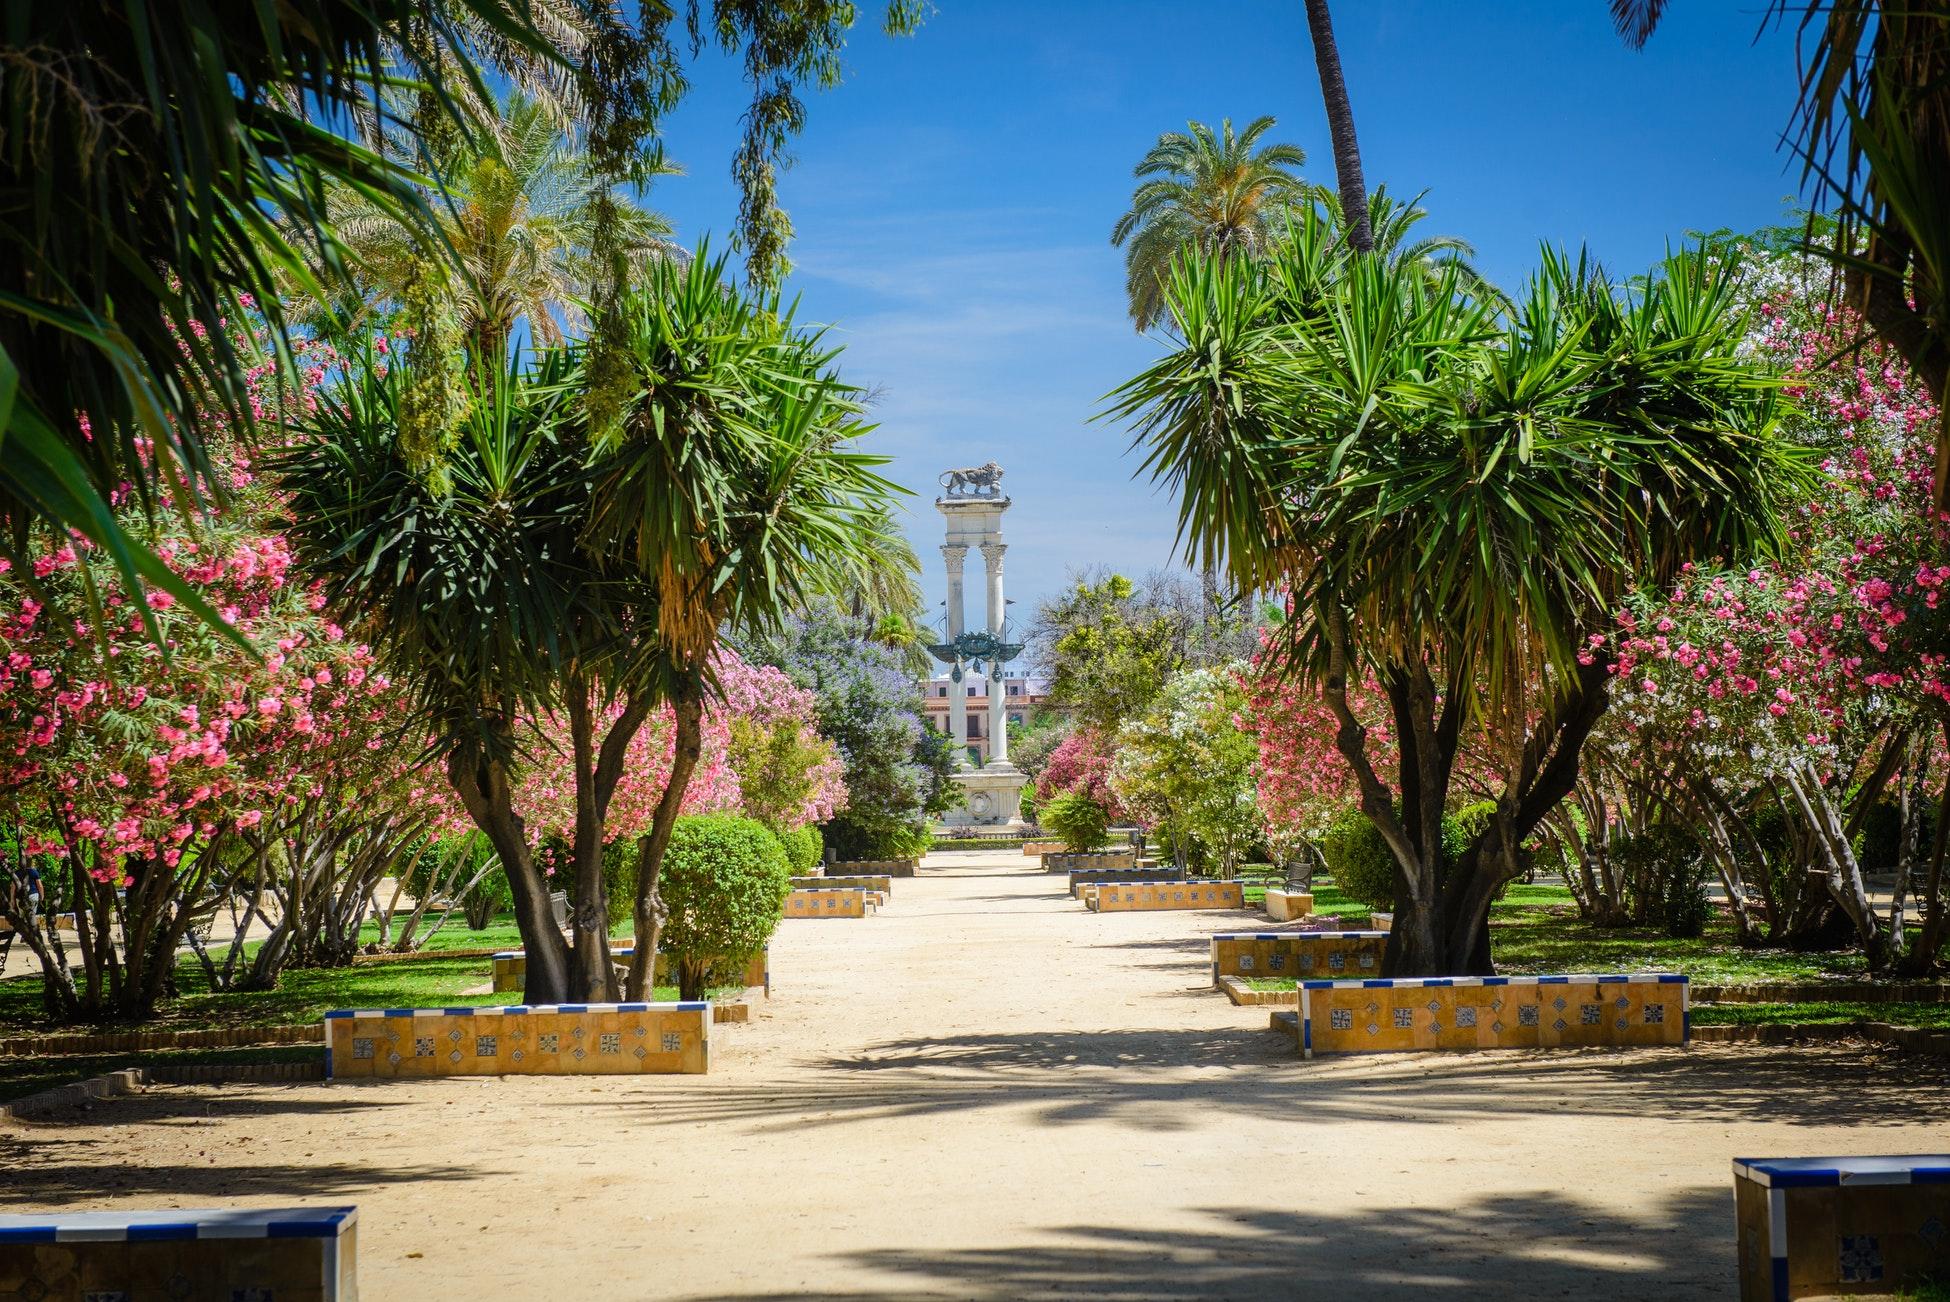 Jardin espagnol